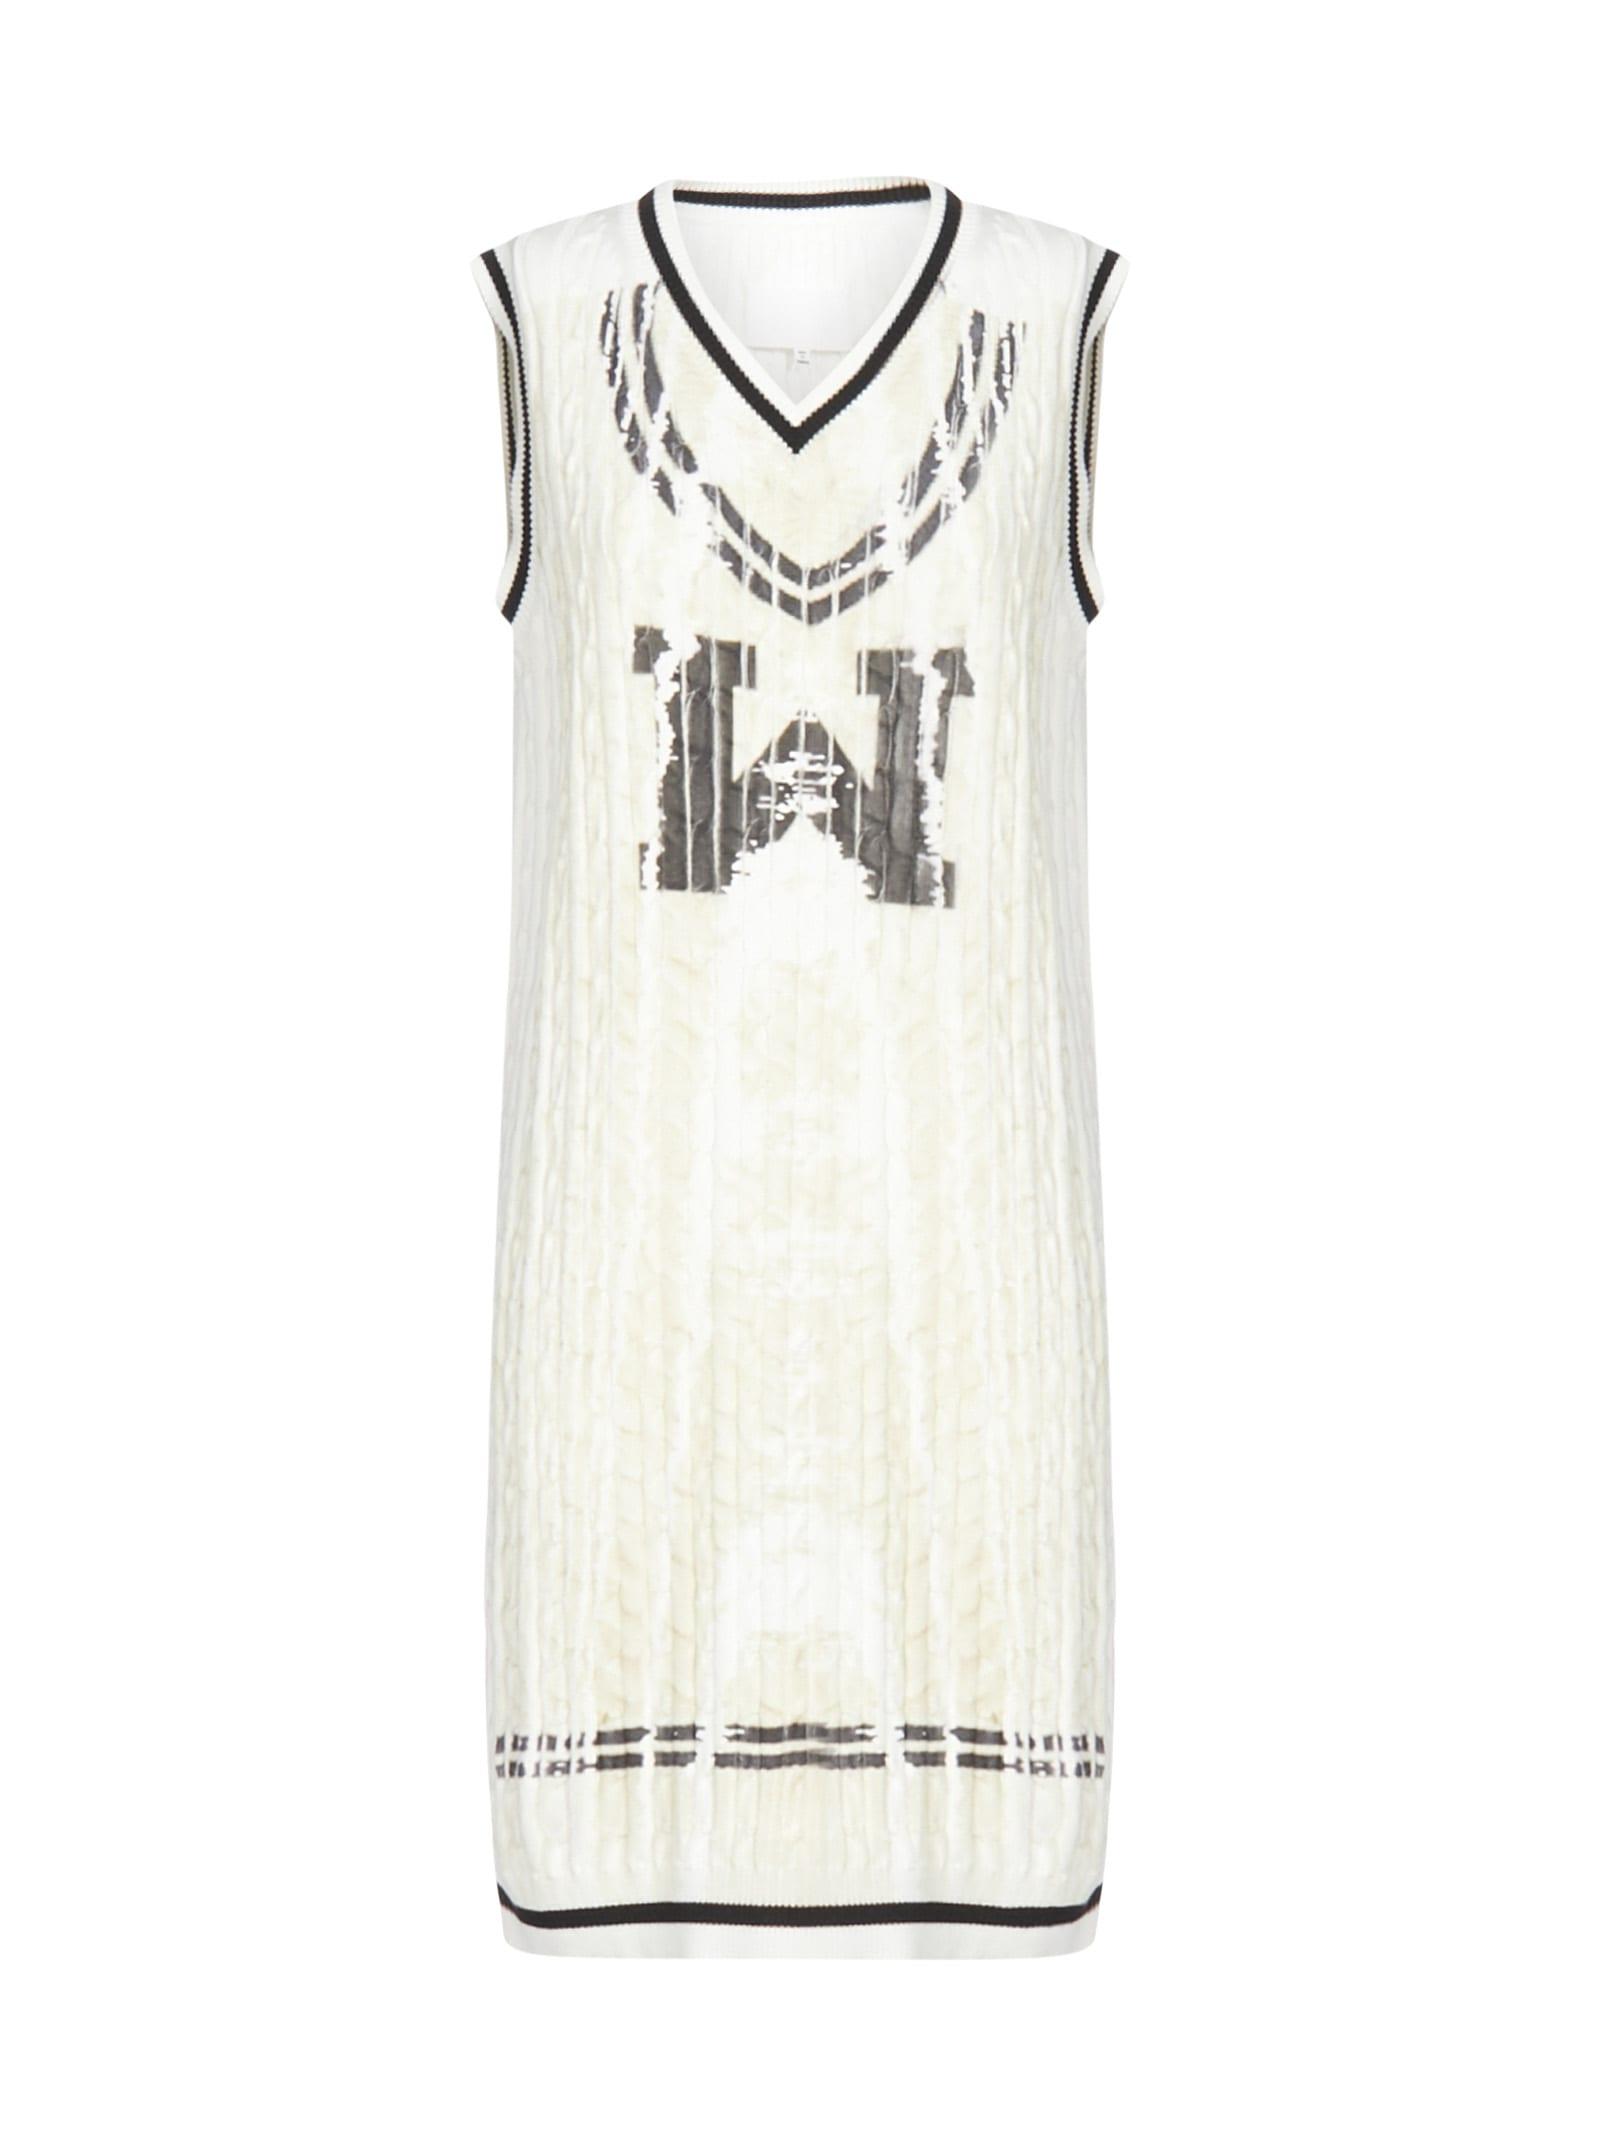 Buy Maison Margiela Gauge 7 Rib And Cable Dress online, shop Maison Margiela with free shipping